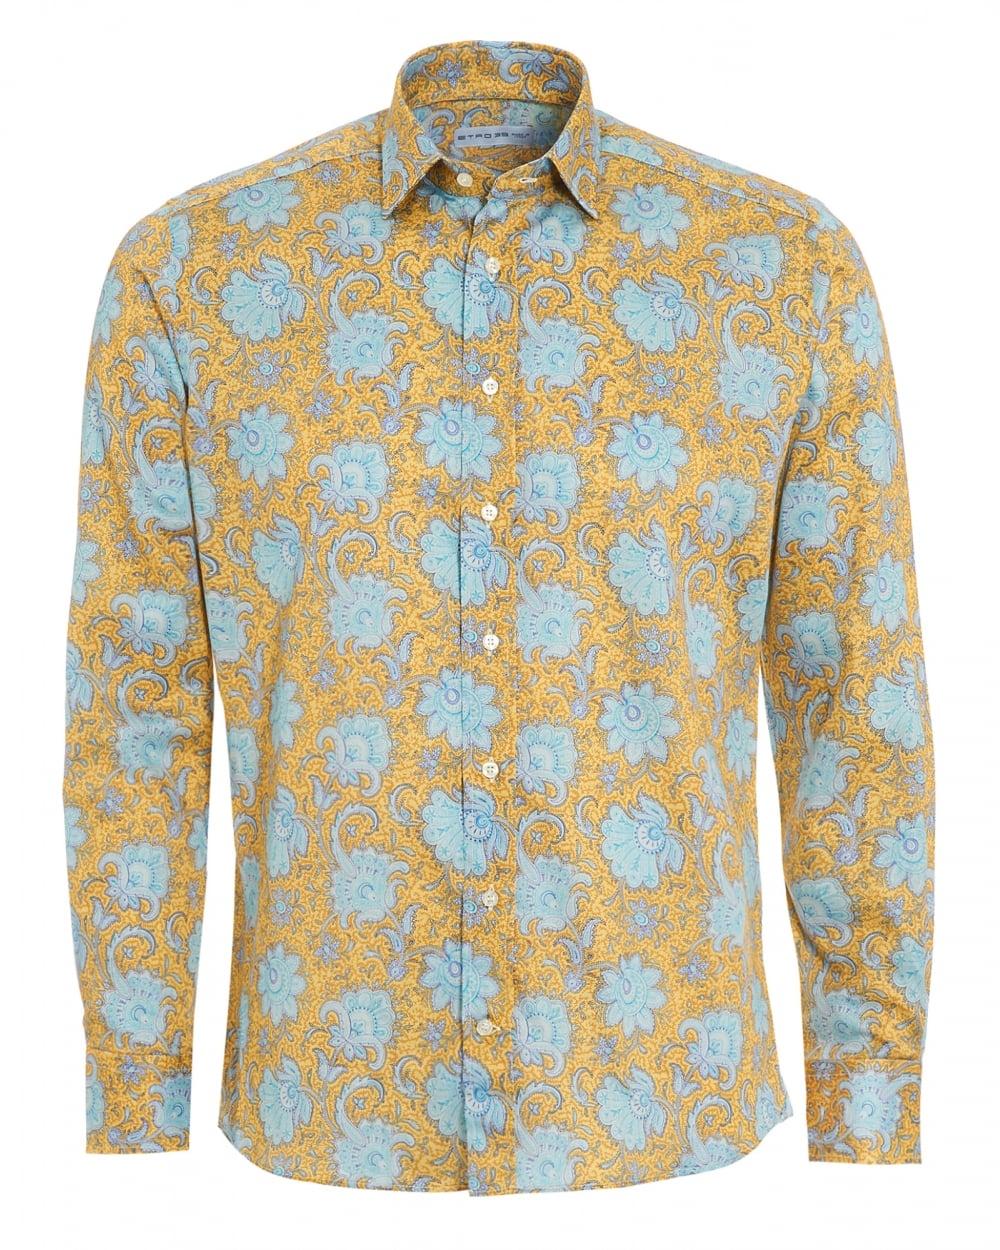 Etro mens large floral print shirt regular fit yellow shirt for Flower print mens shirt